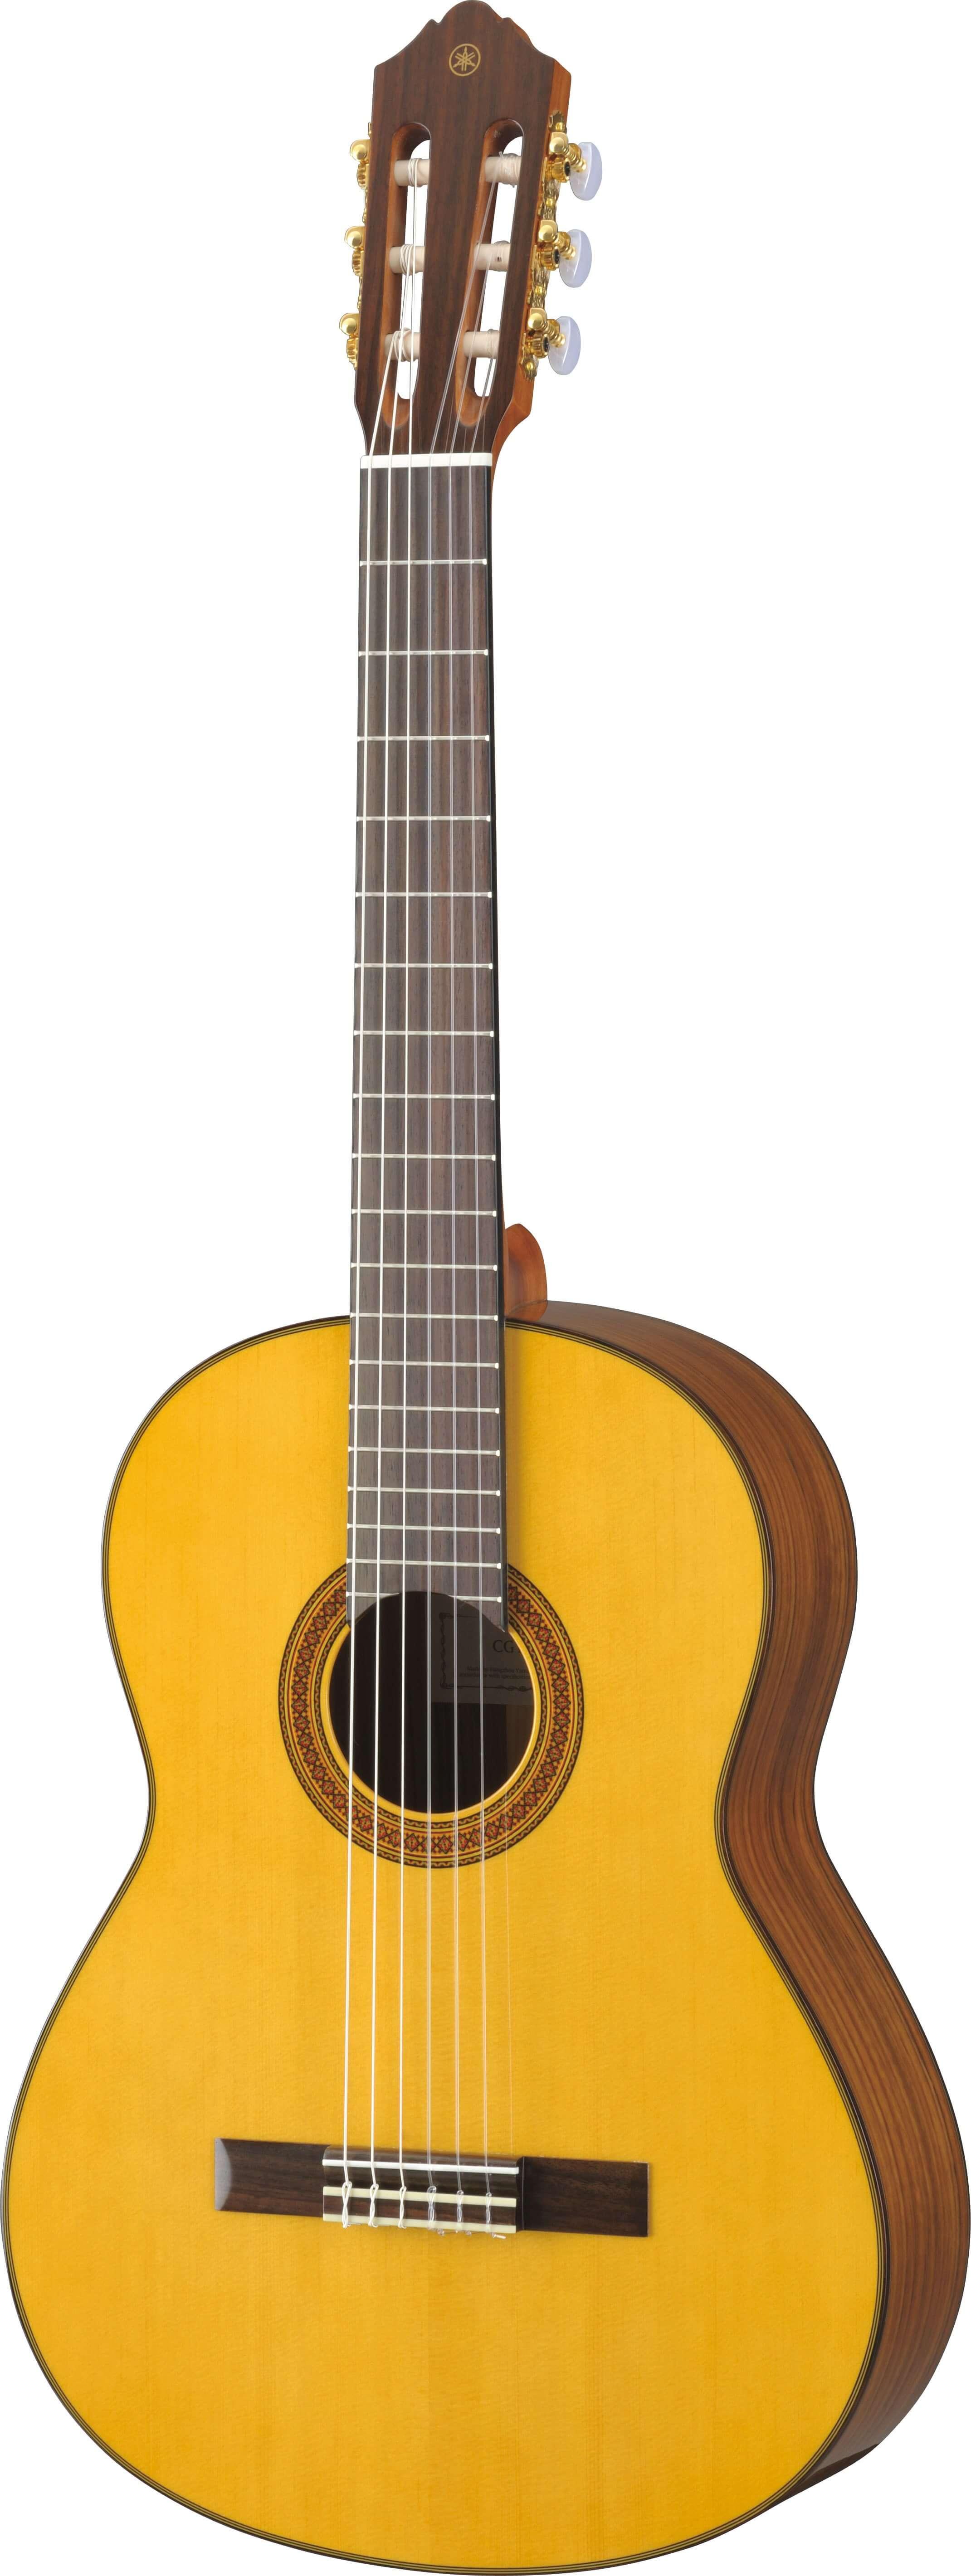 Guitarra Clásica Yamaha CG162S Abeto